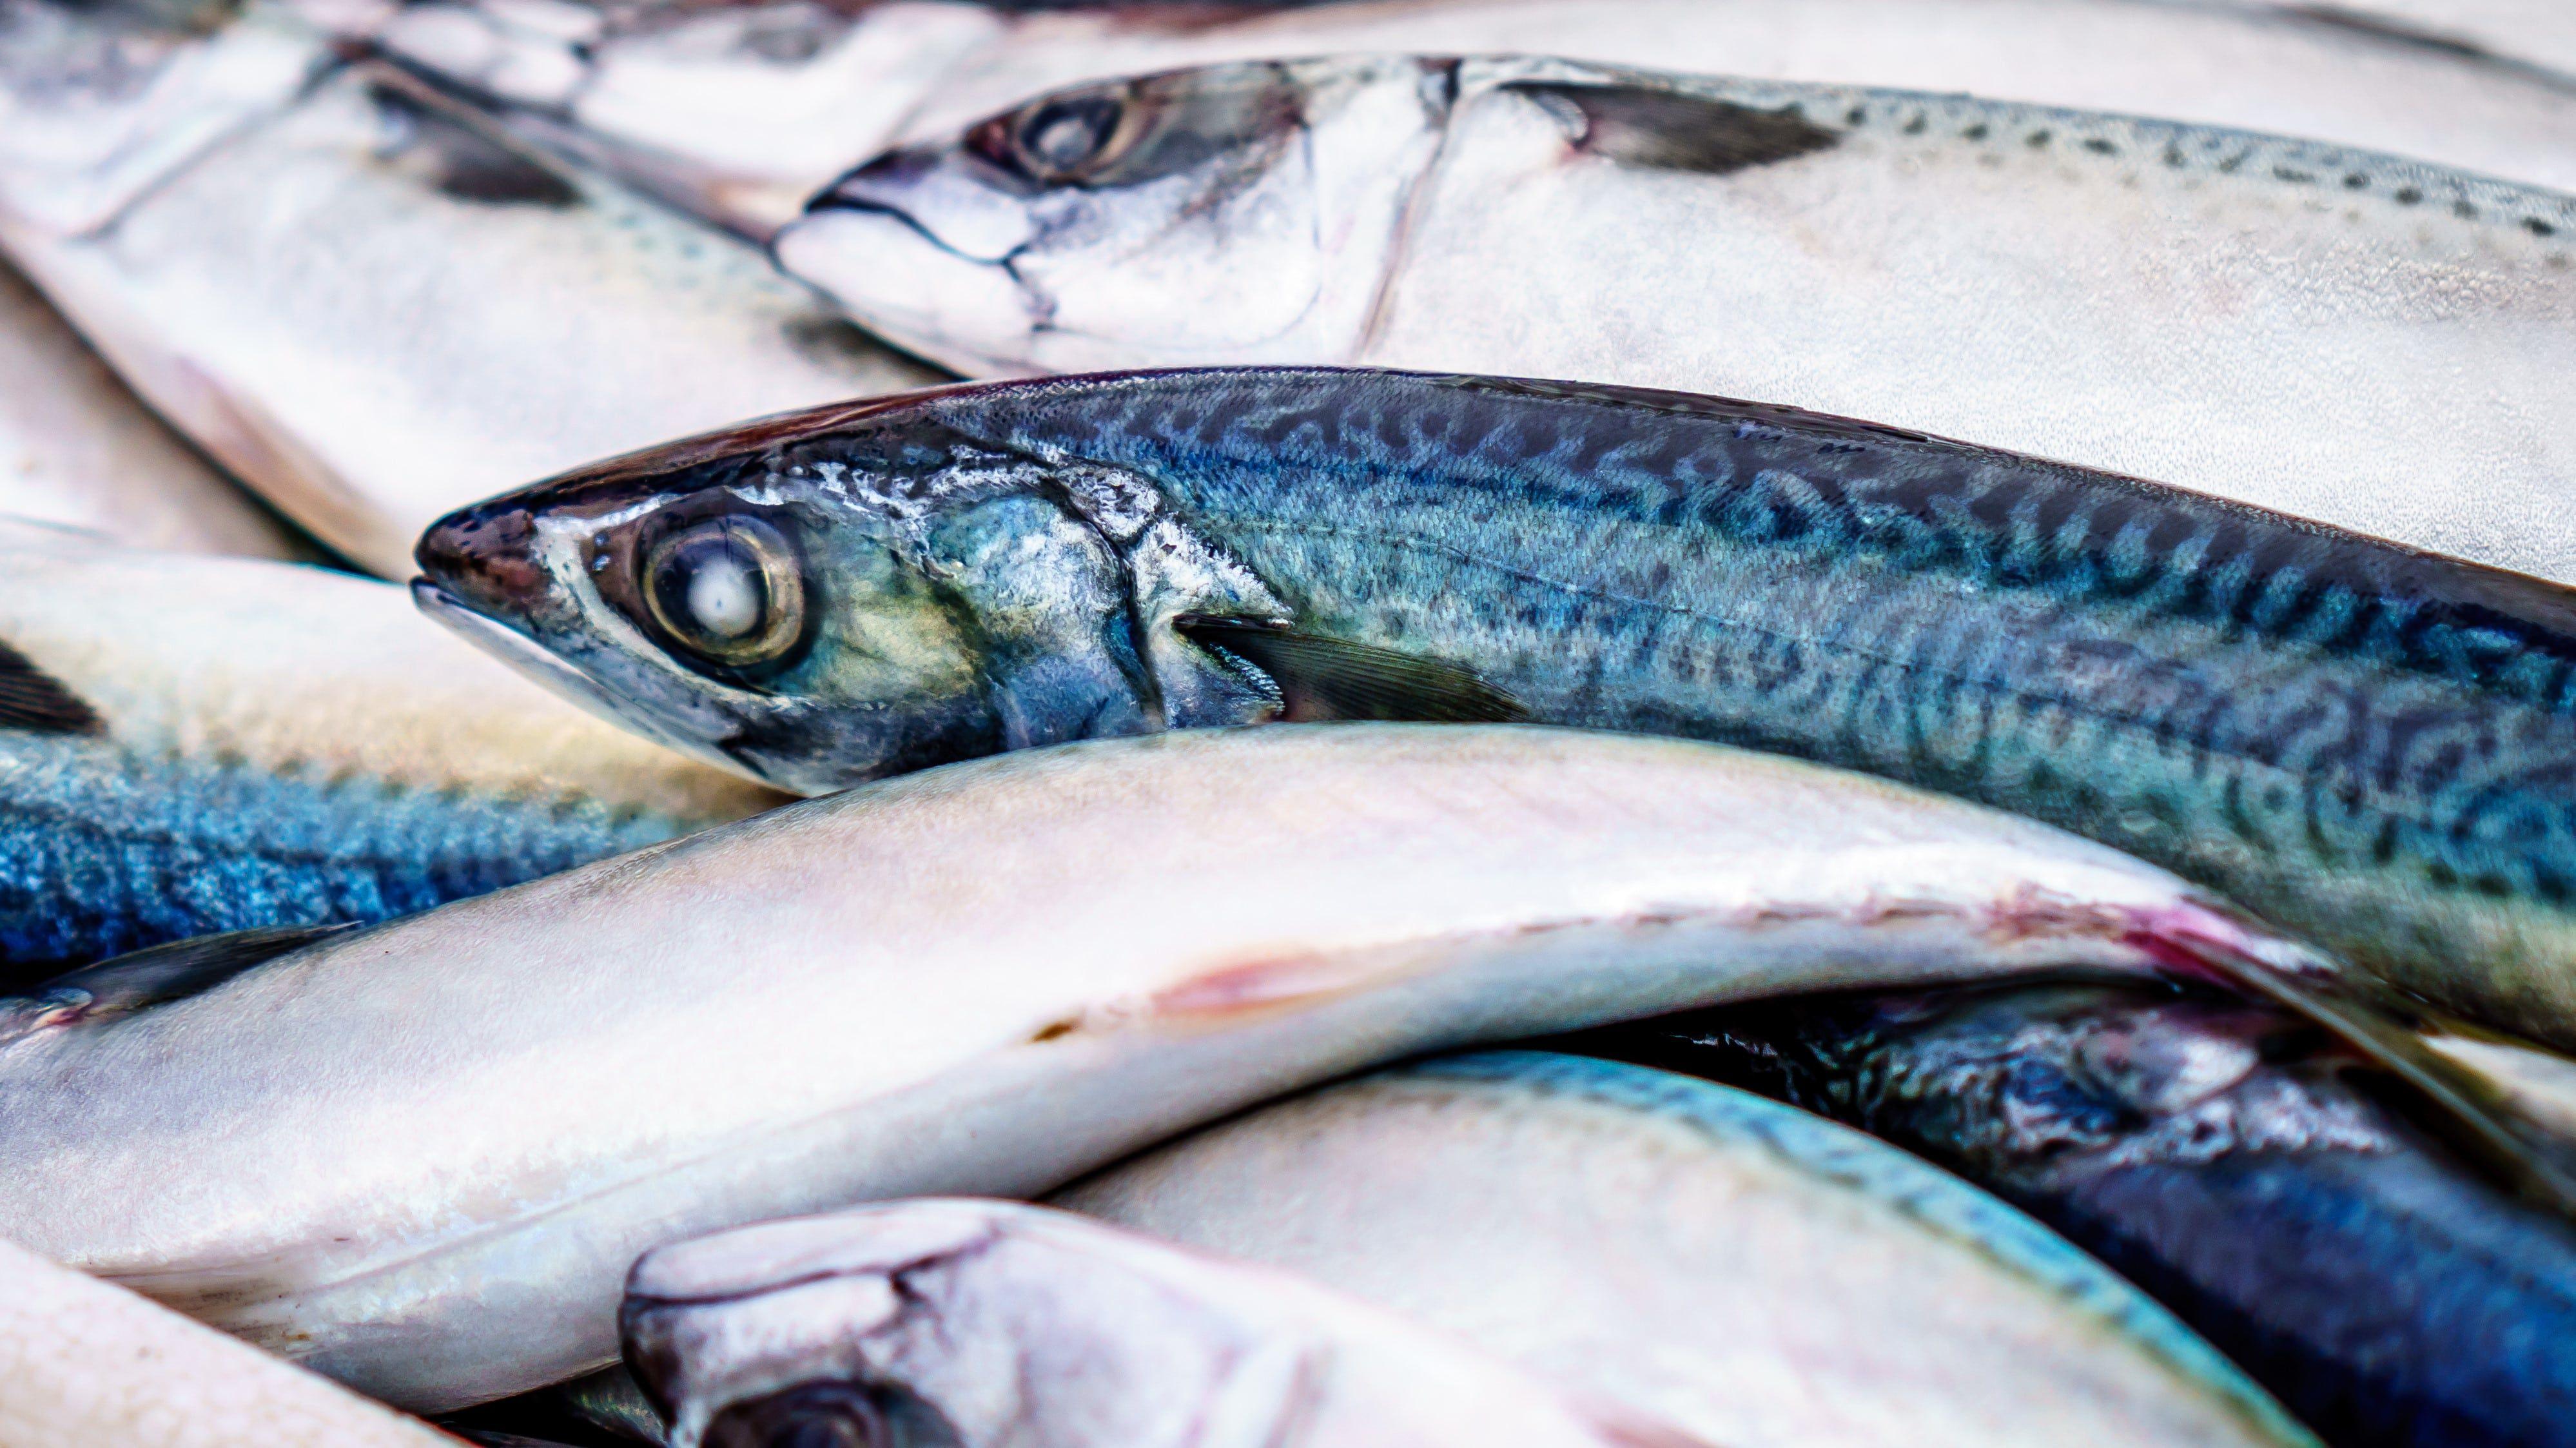 7. Ikan laut menjadi makanan pelepas lelah setelah melakukan perjalanan